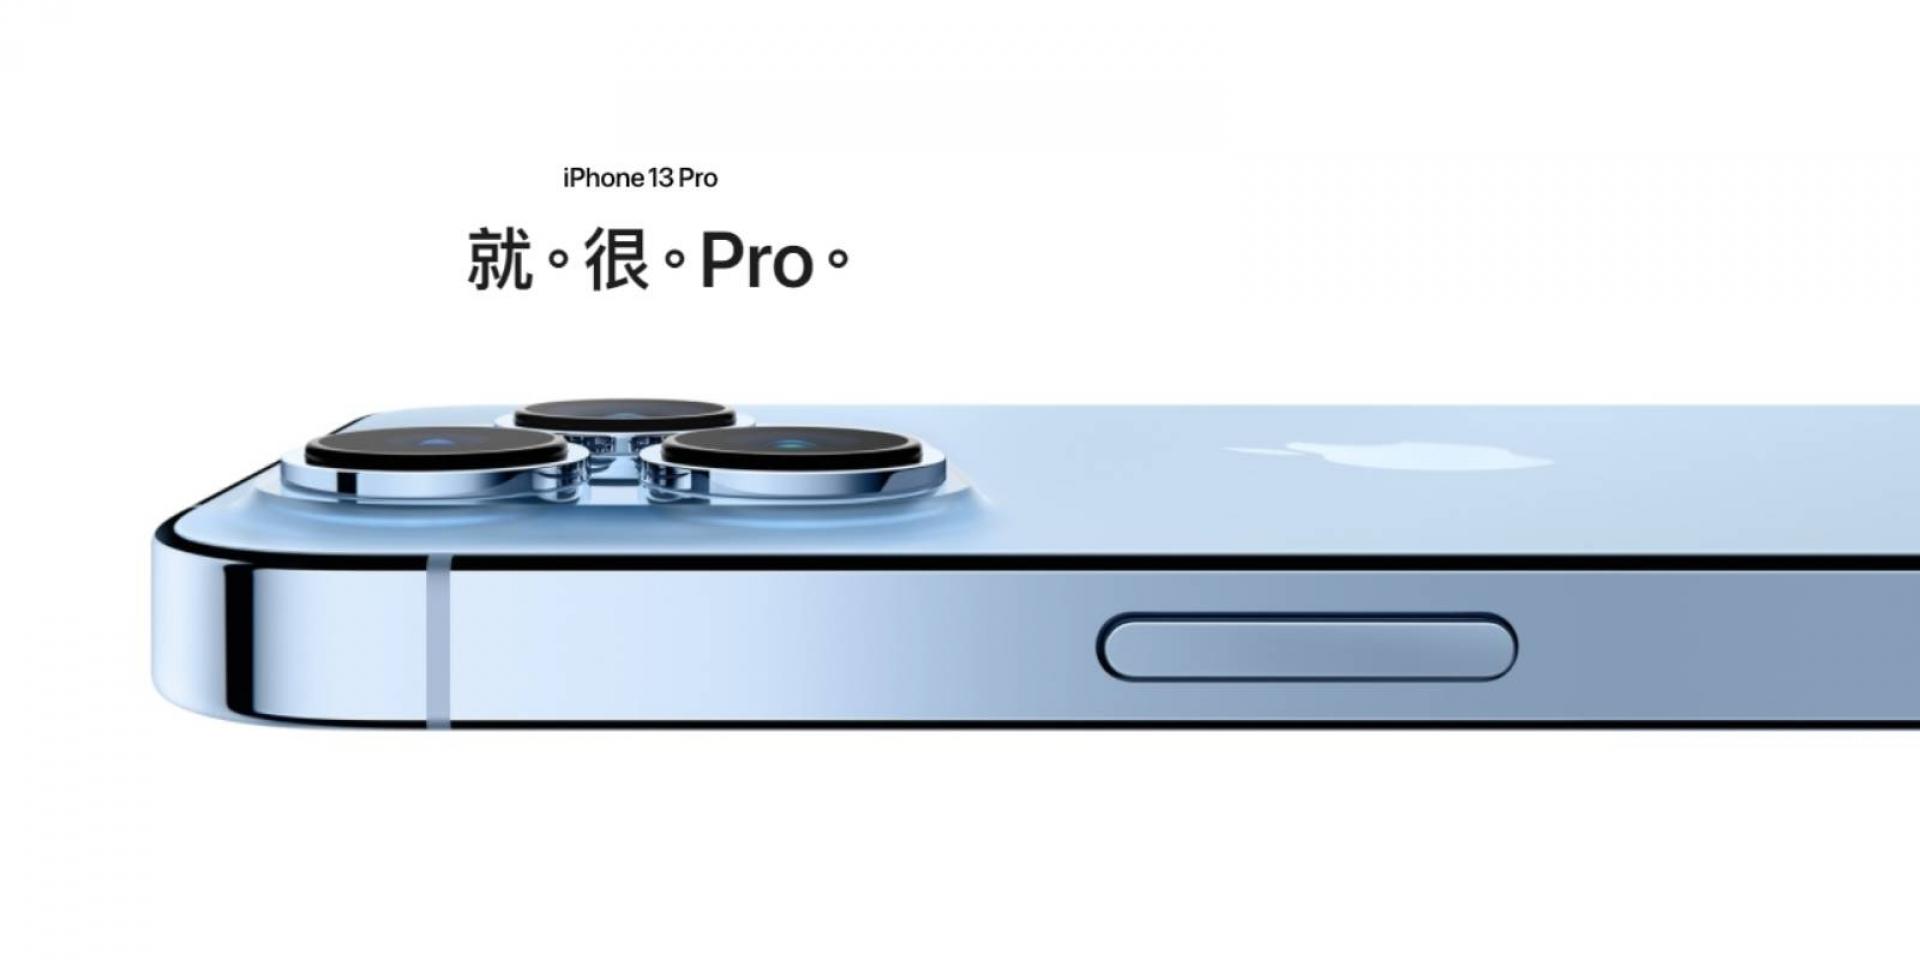 120Hz自適應螢幕、拍攝功能升級!APPLE iPhone 13 Pro/Max 32,900元起發表